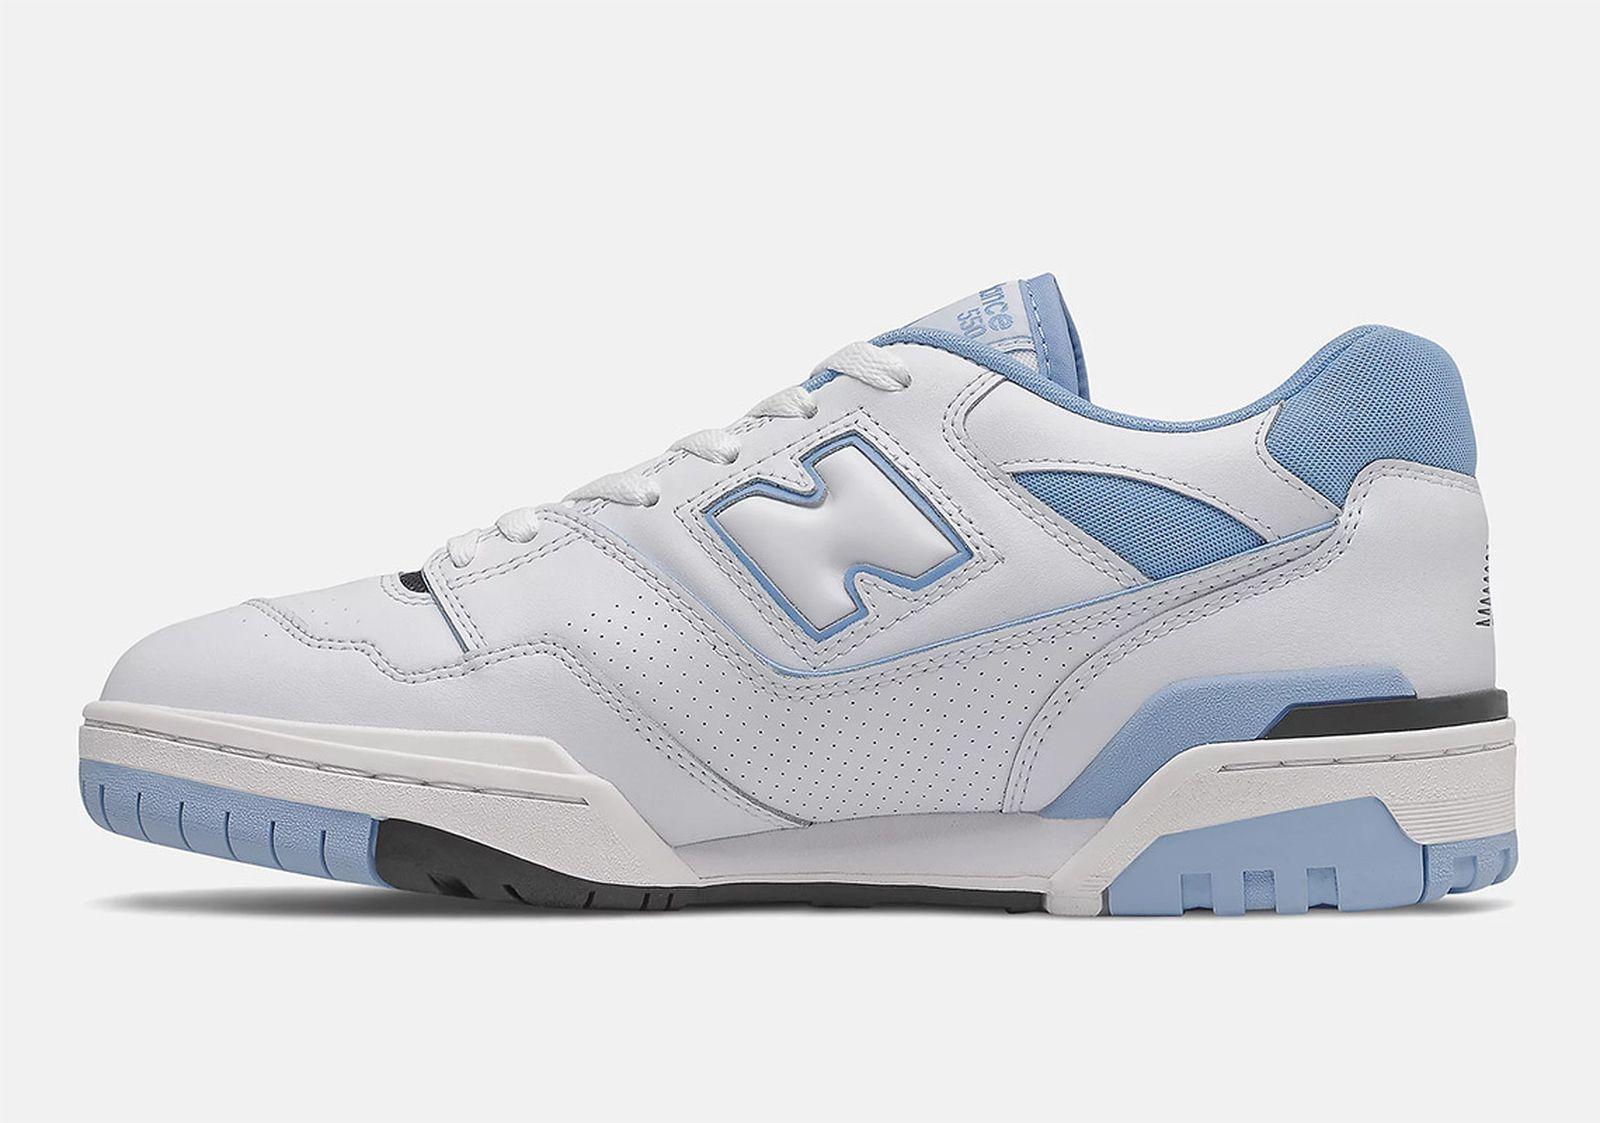 new-balance-550-light-blue-release-date-price-01